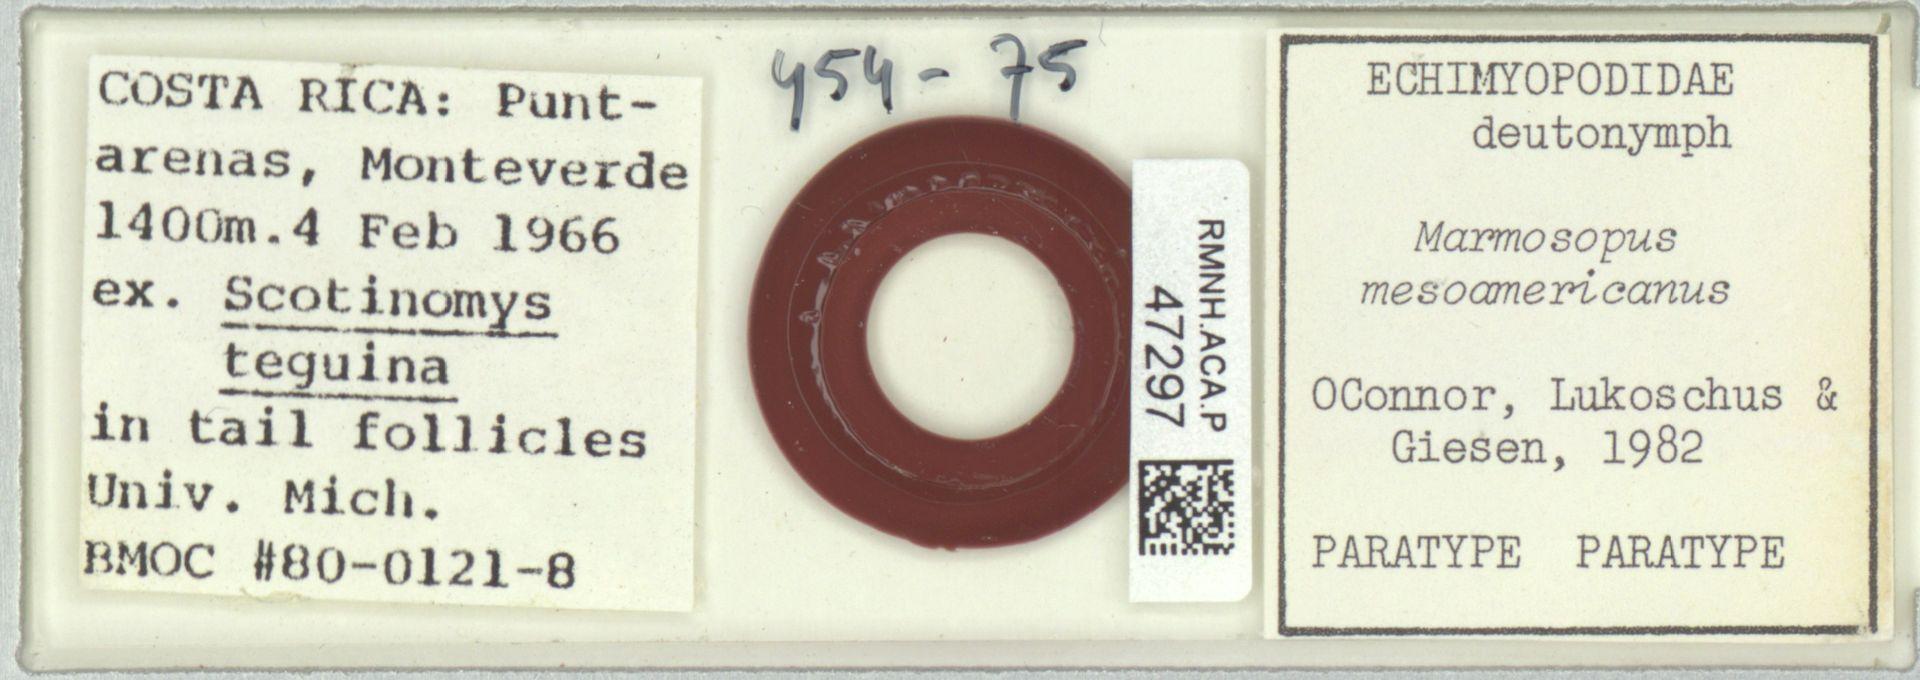 RMNH.ACA.P.47297 | Echimyopodidae;Marmosopus mesoamericanus OConnor, Lukoschus & Giesen, 1982 OConnor, Lukoschus & Giesen, 1982